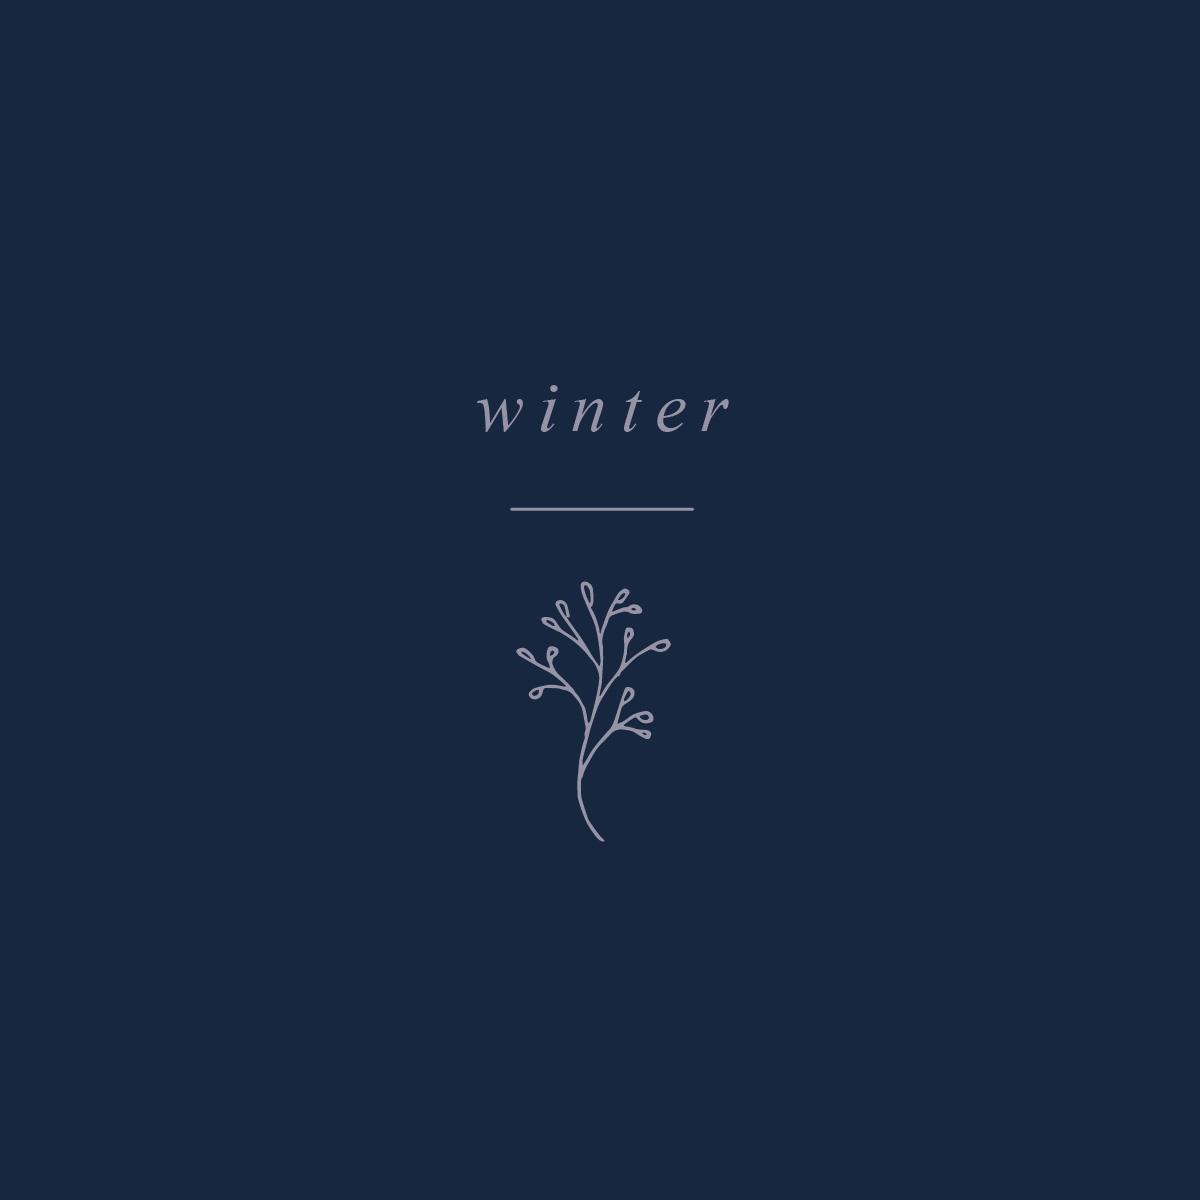 winter-03.jpg